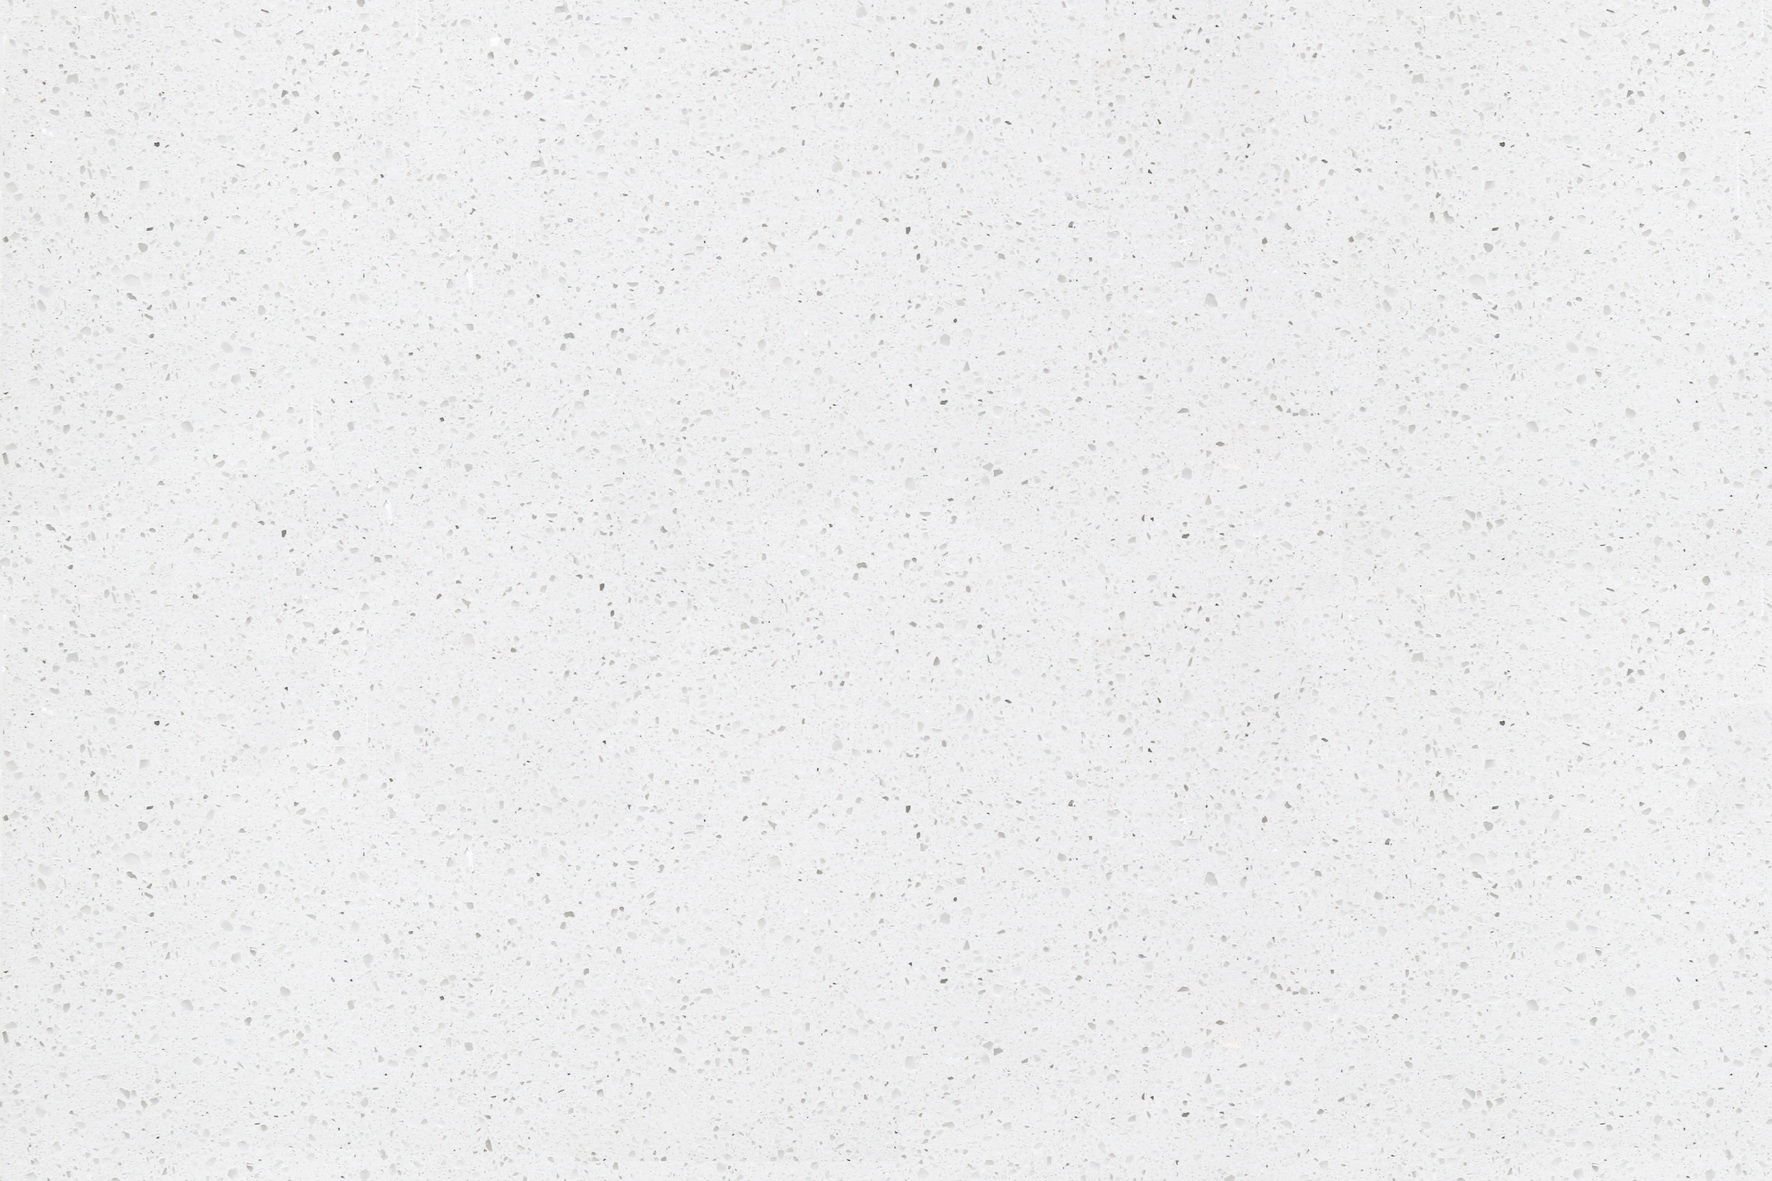 RAINBOW WHITE UNIPLUS UNIPLUS LUCIDE Foto: 1_47530_37639.jpg